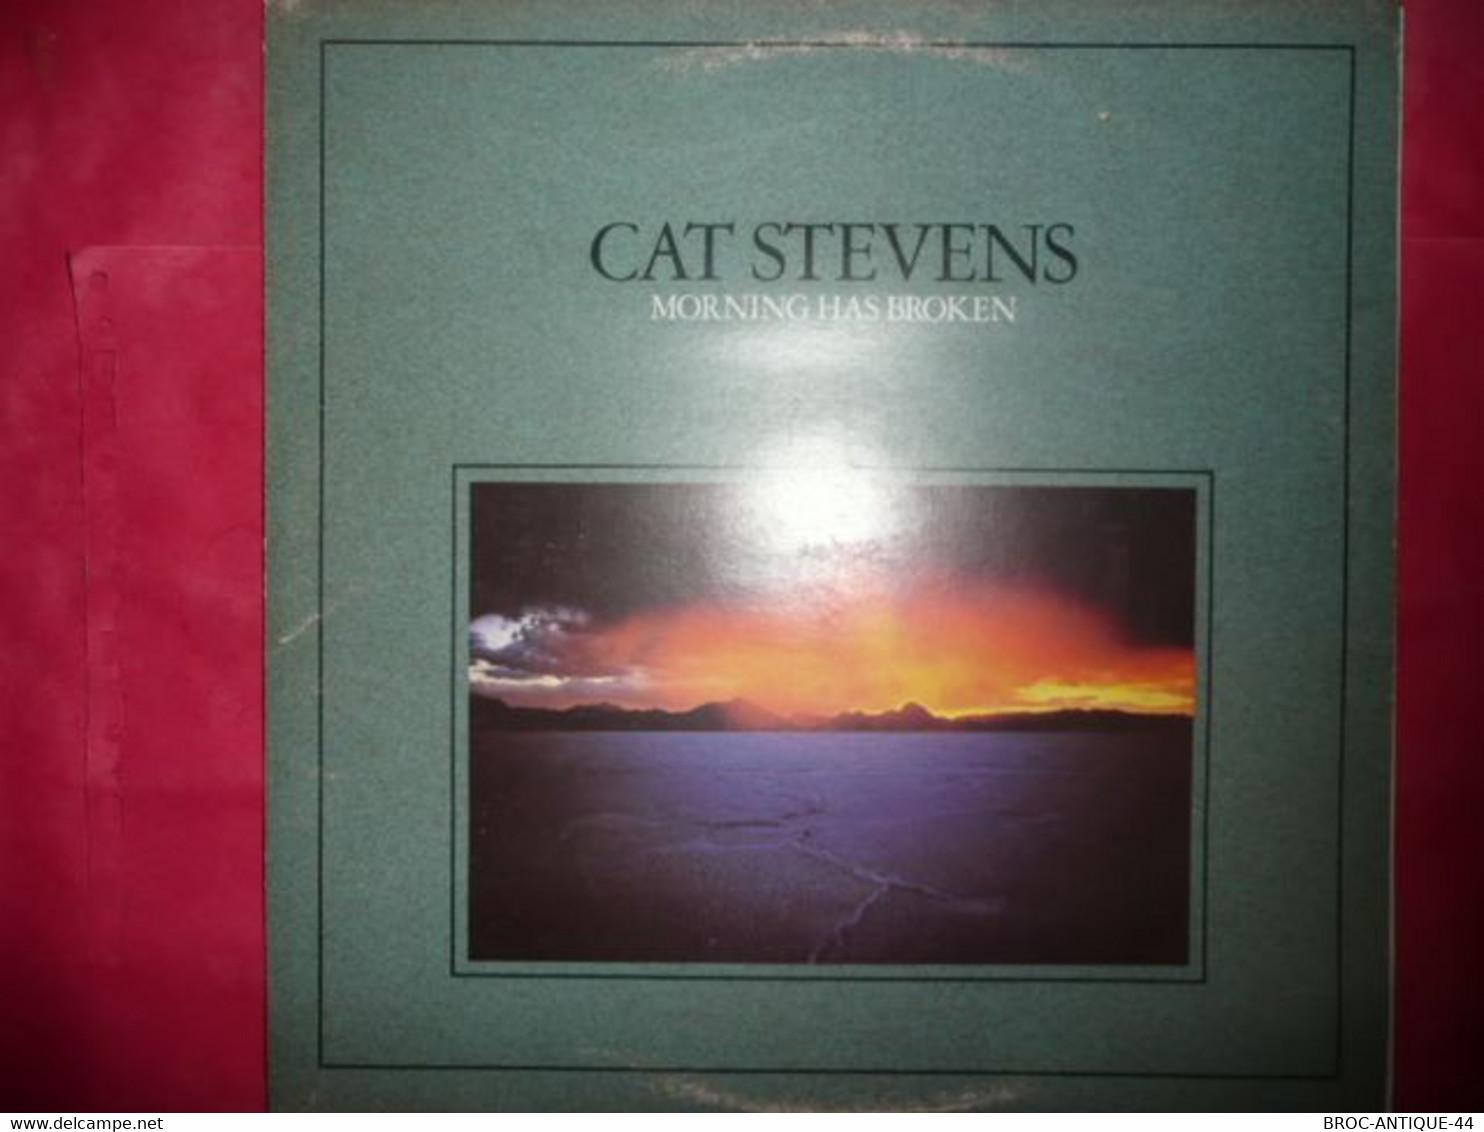 LP33 N°7073 - CAT STEVENS - 6313 286 - PG 223 + GROS BOOK - POP ROCK - Rock